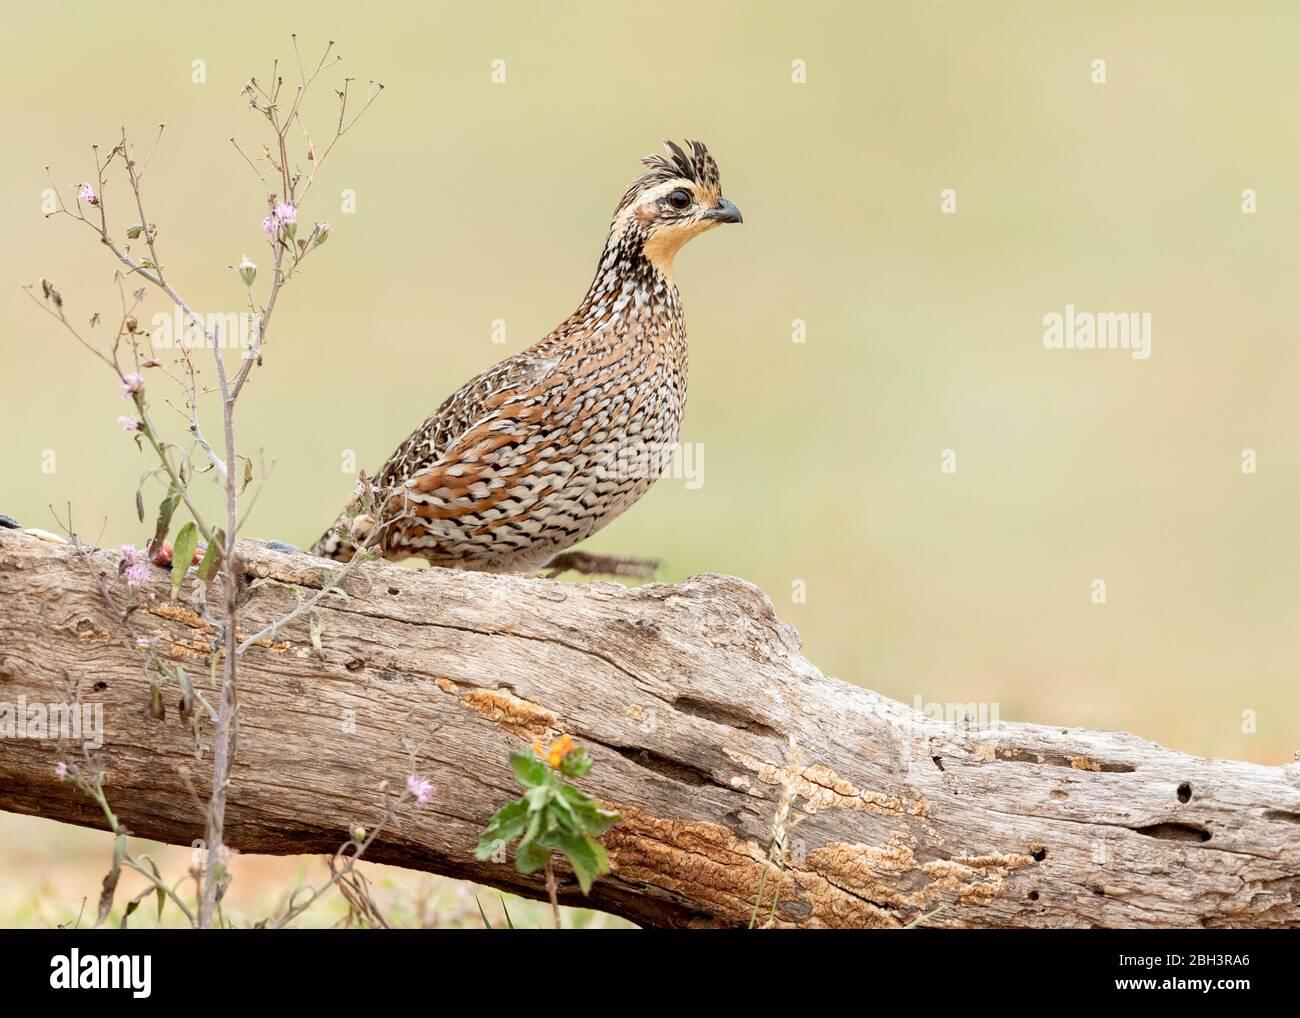 Northern Bobwhite (Colinus virginianus), Laguna Seca Ranch, Rio Grande Valley, Texas, USA Stock Photo